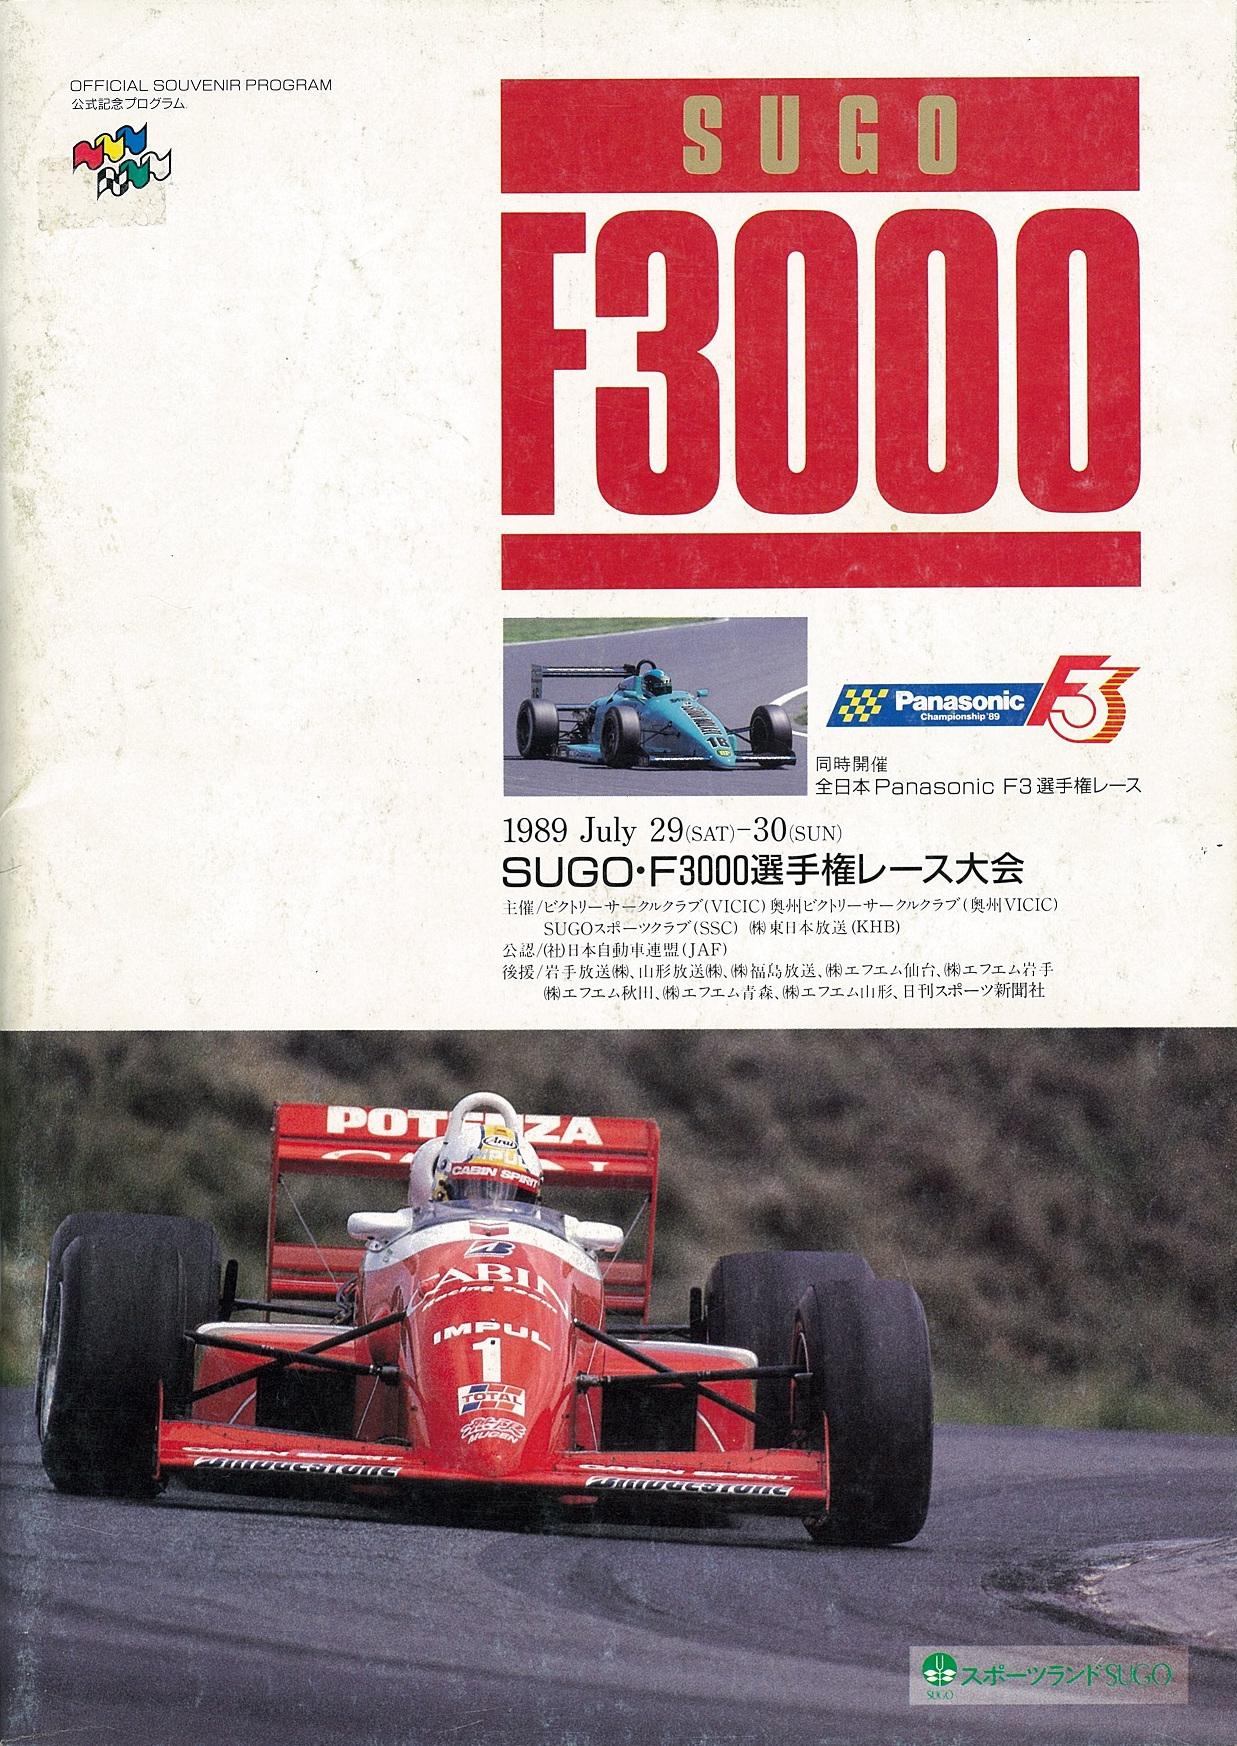 Motor Racing Programme Covers